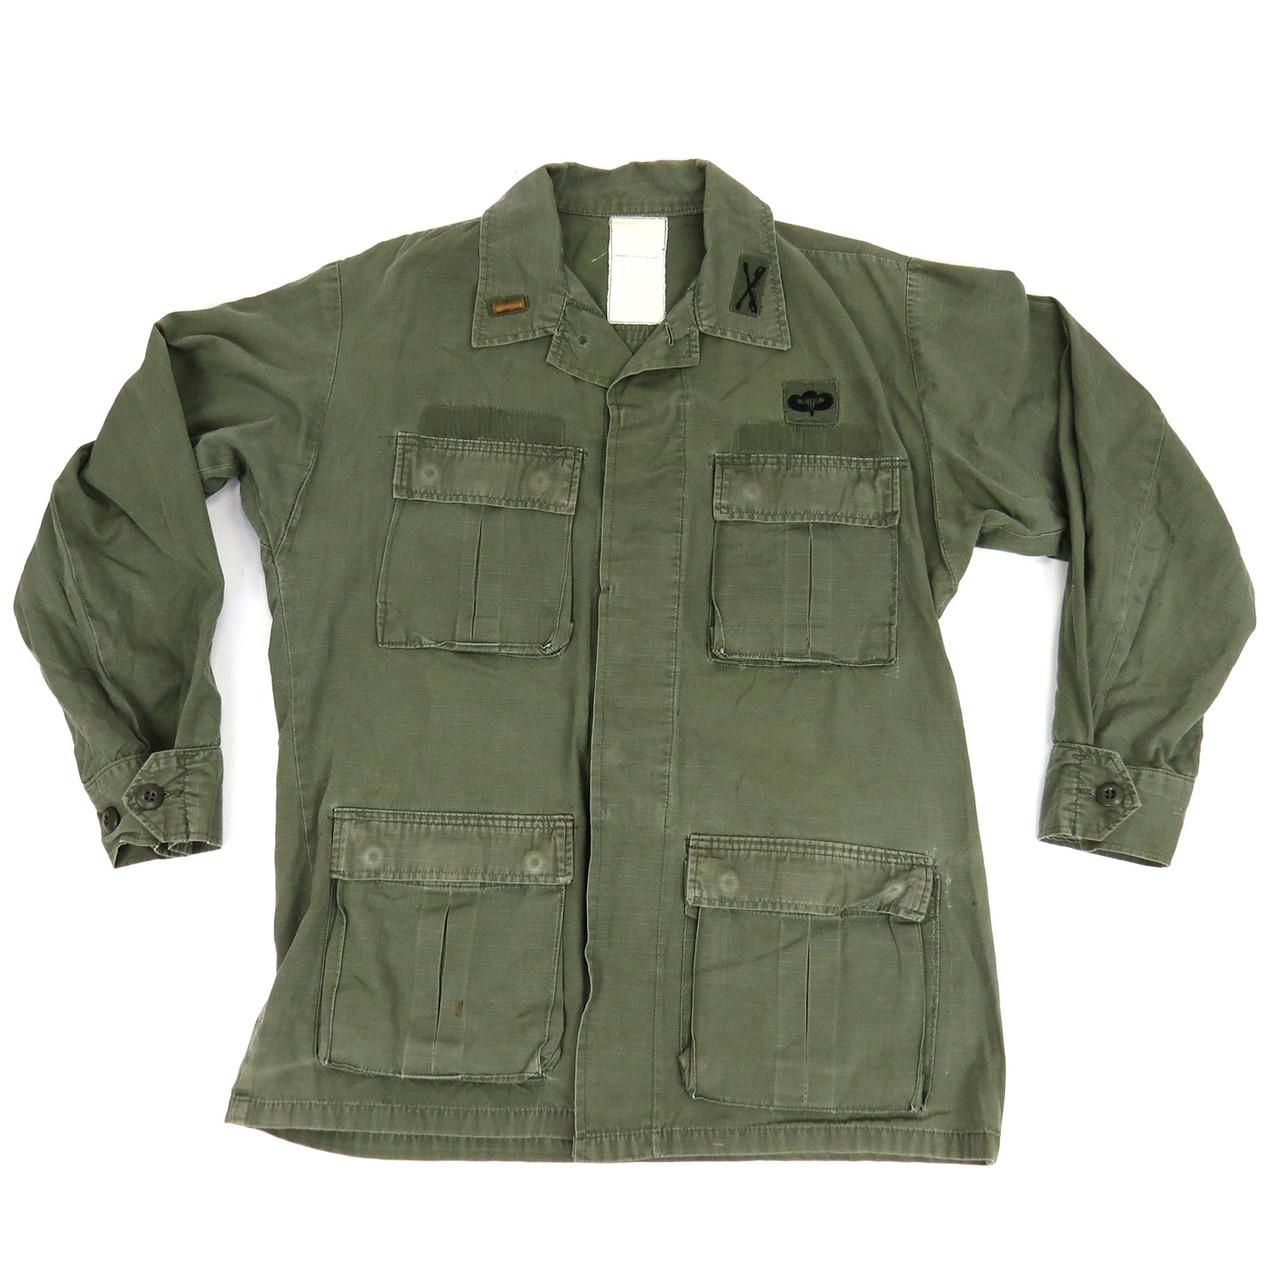 Transitional Jungle Fatigue Shirt